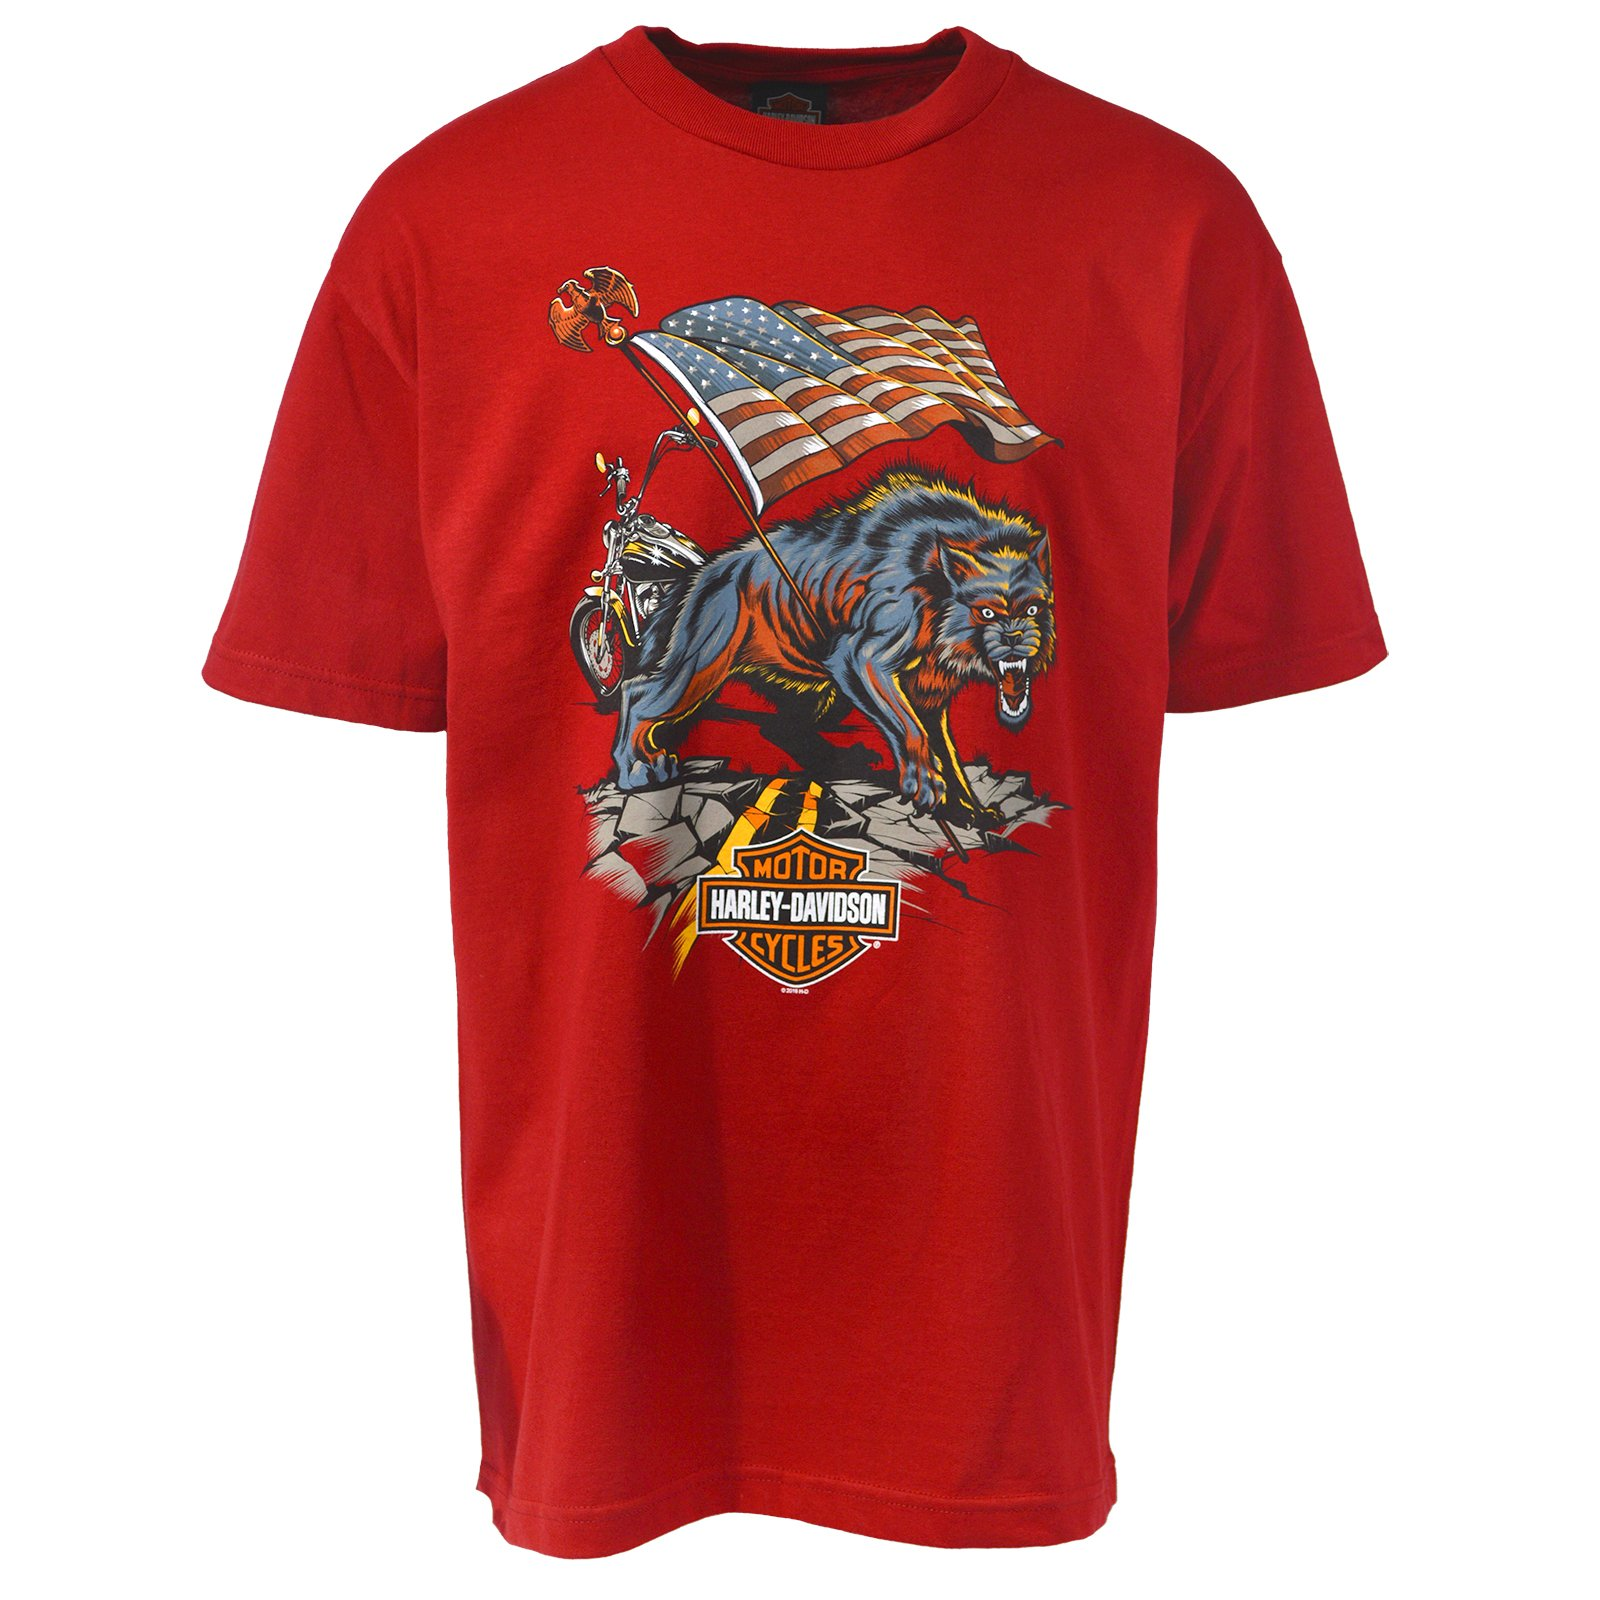 ca4a87f89 Harley-Davidson Lone Wolf T-Shirt - Military Sales   NAS Sigonella XL  Apparel